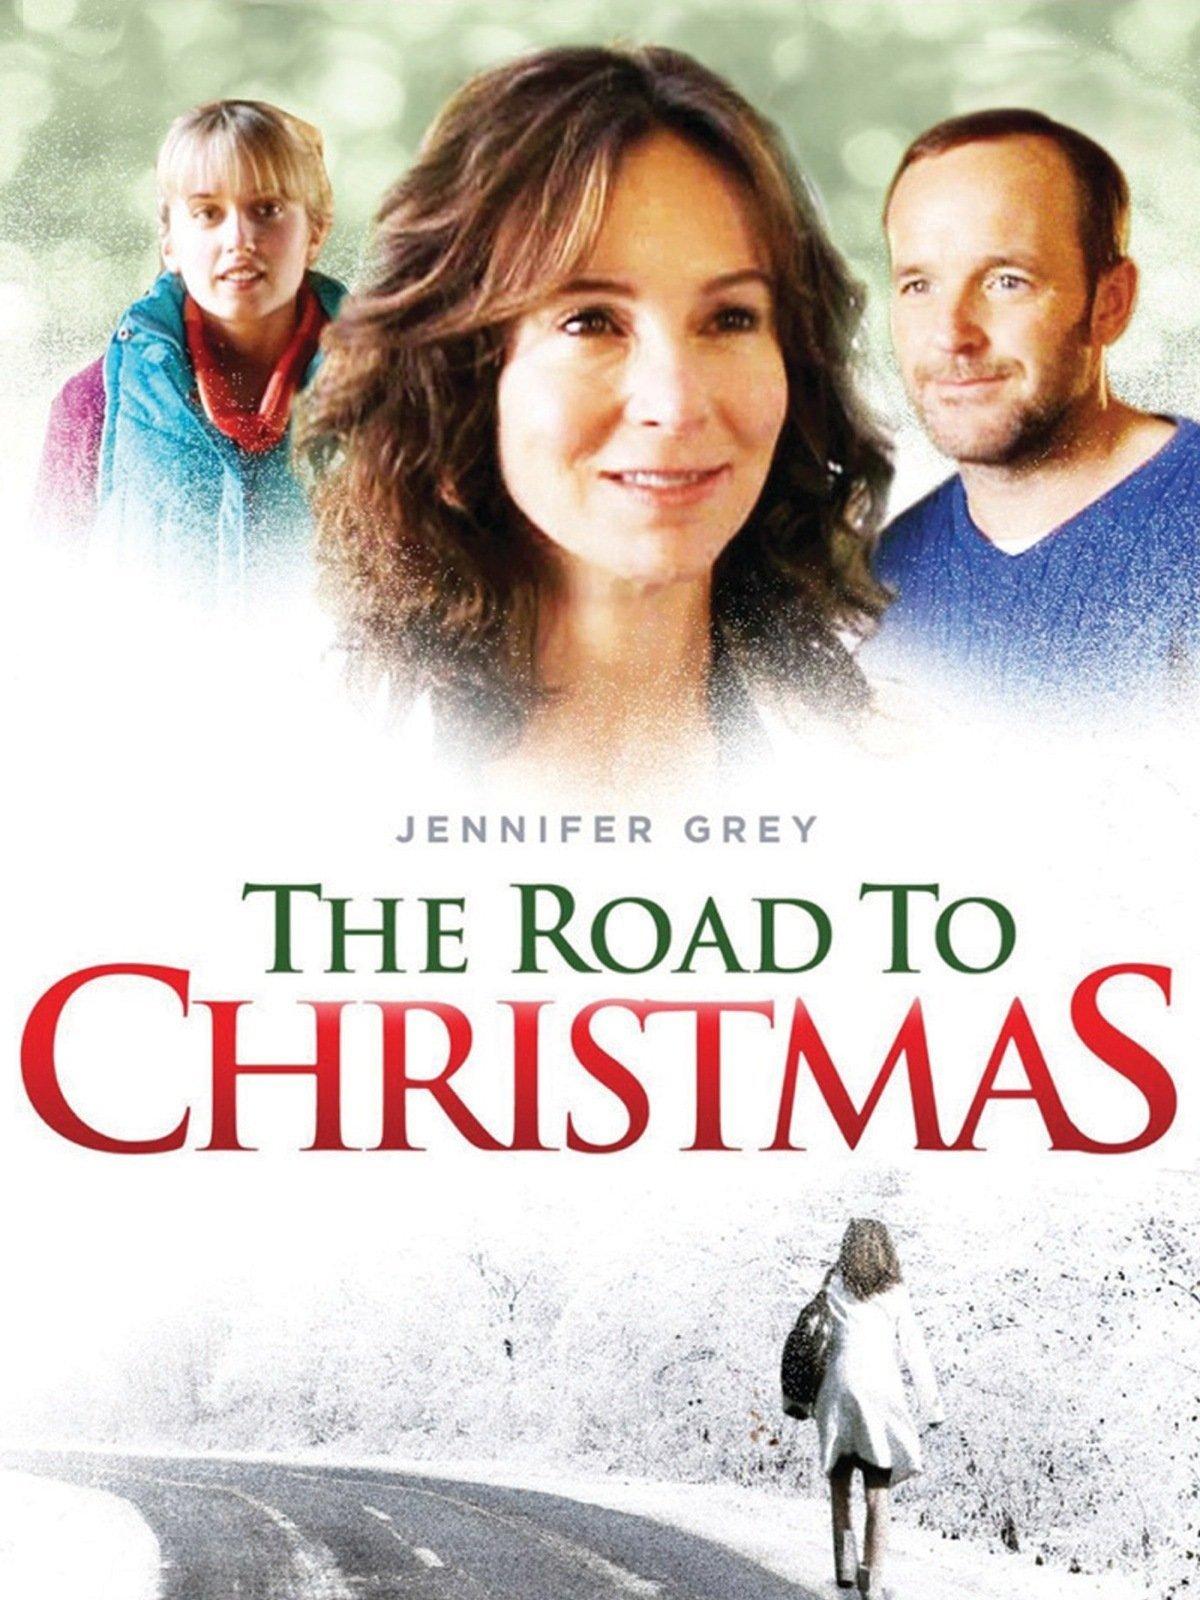 Amazon.com: Road to Christmas: Jennifer Grey, Megan Park, Clark ...